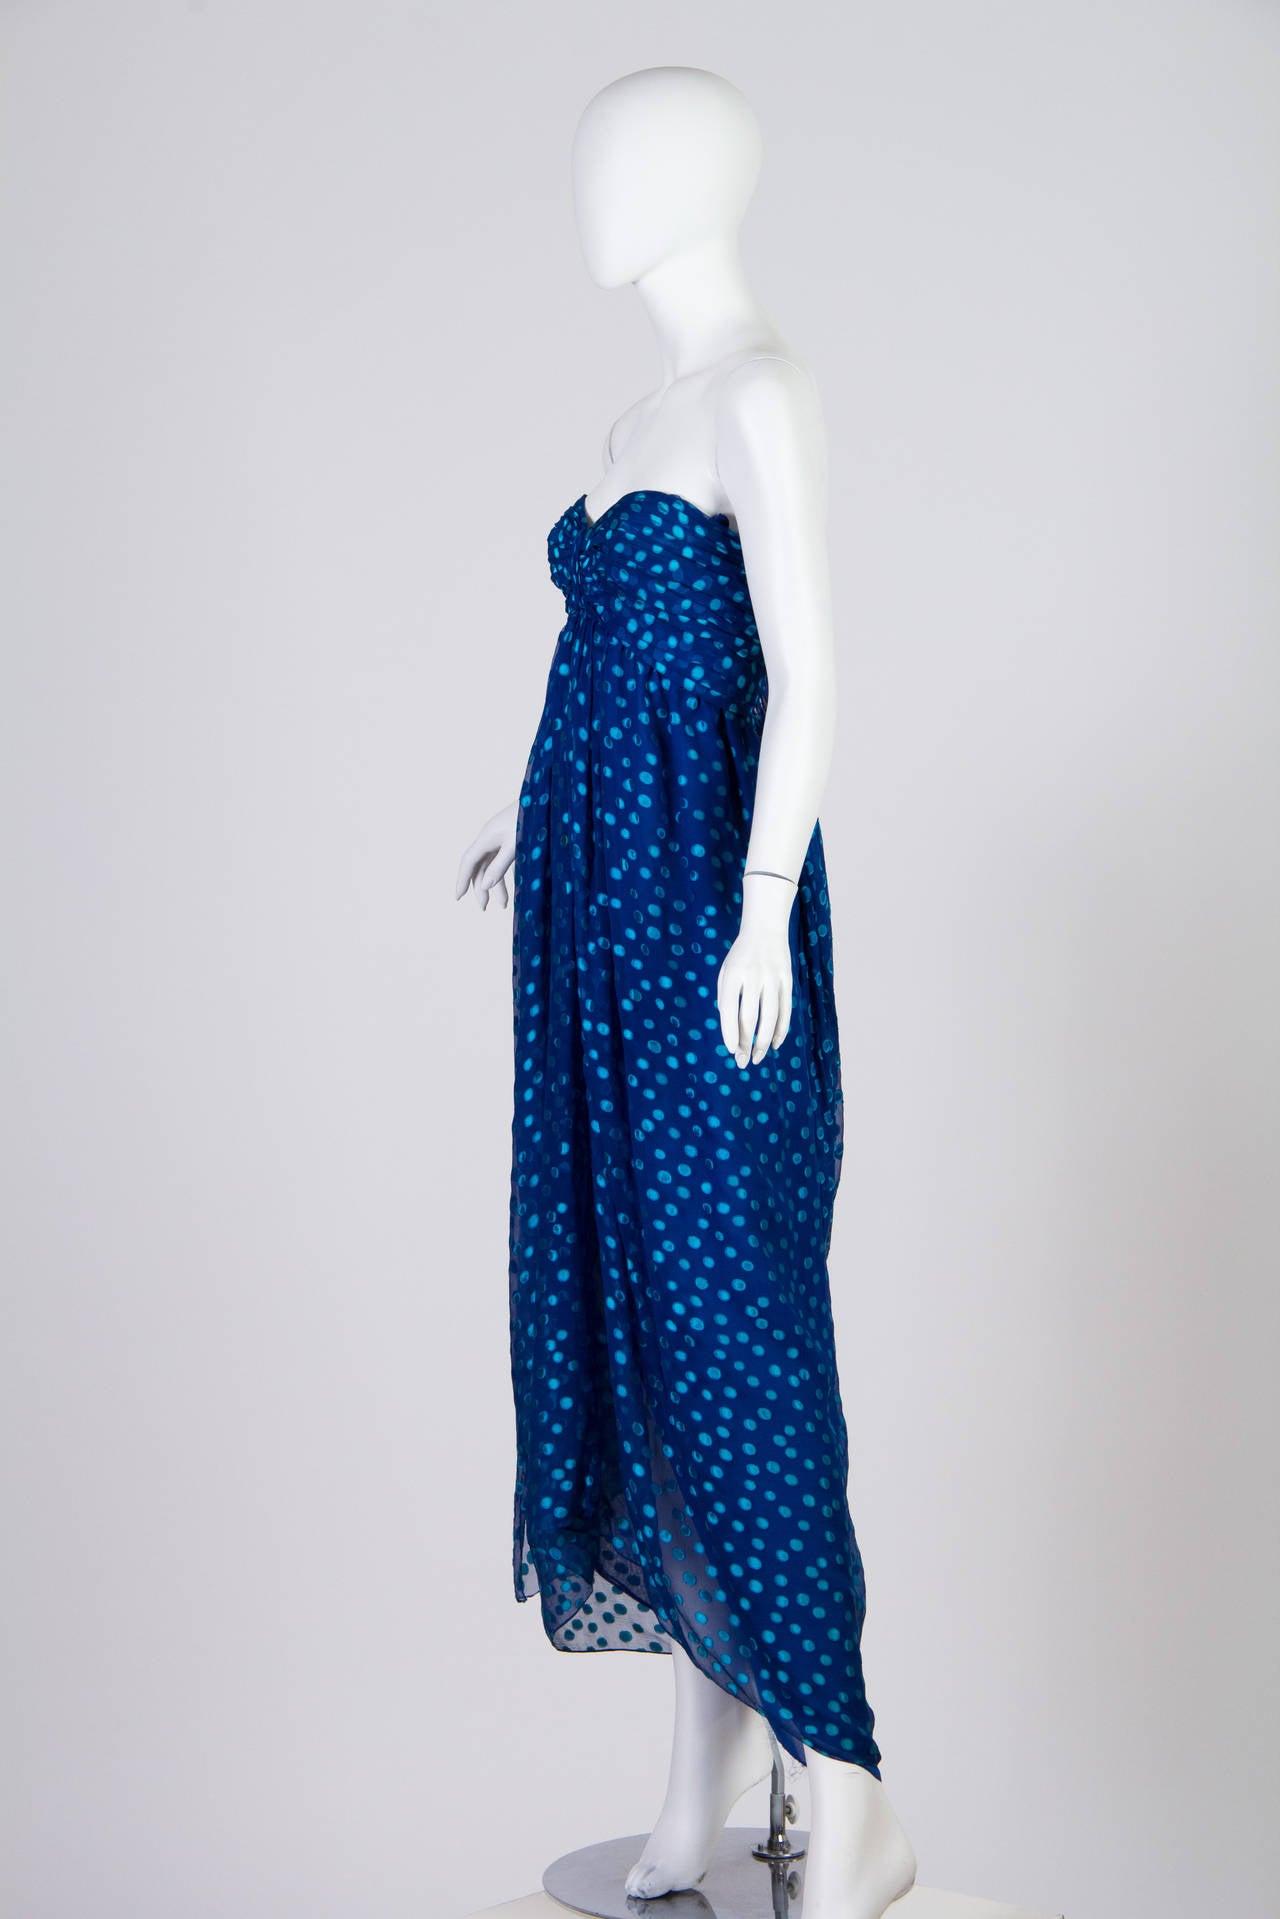 1970s Oscar de la Renta Chiffon Dress In Good Condition For Sale In New York, NY